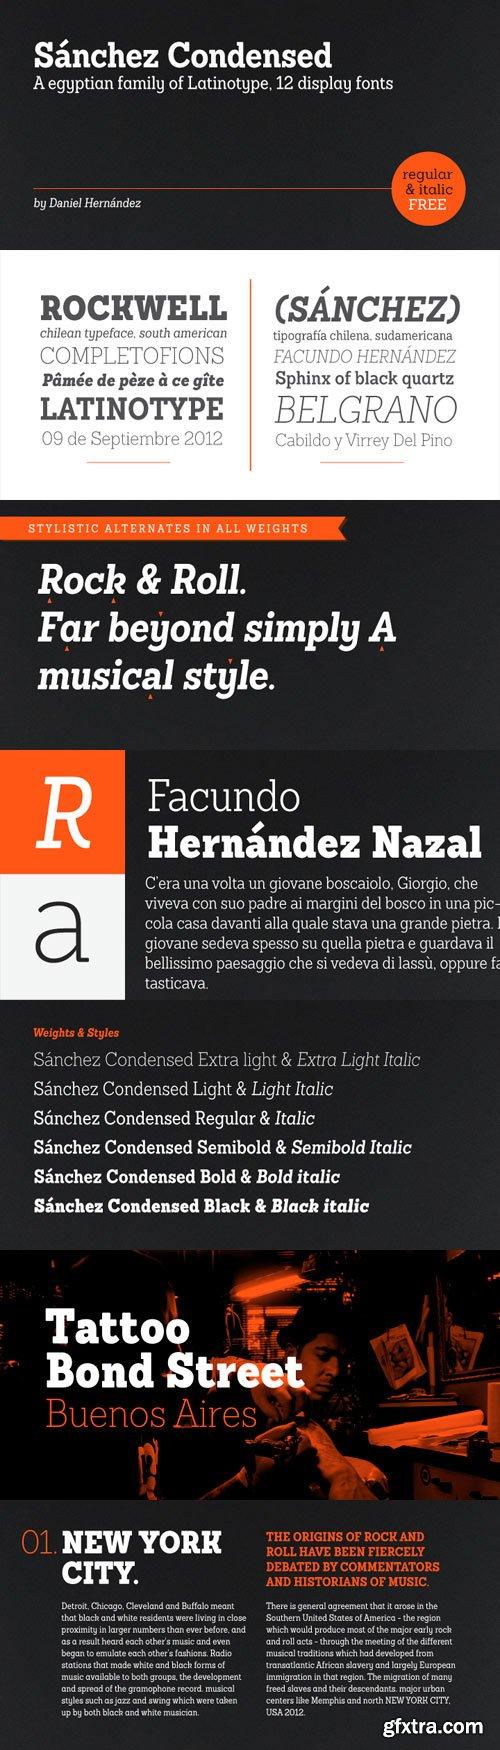 Sanchez Condensed Font Family - 12 Fonts for $126